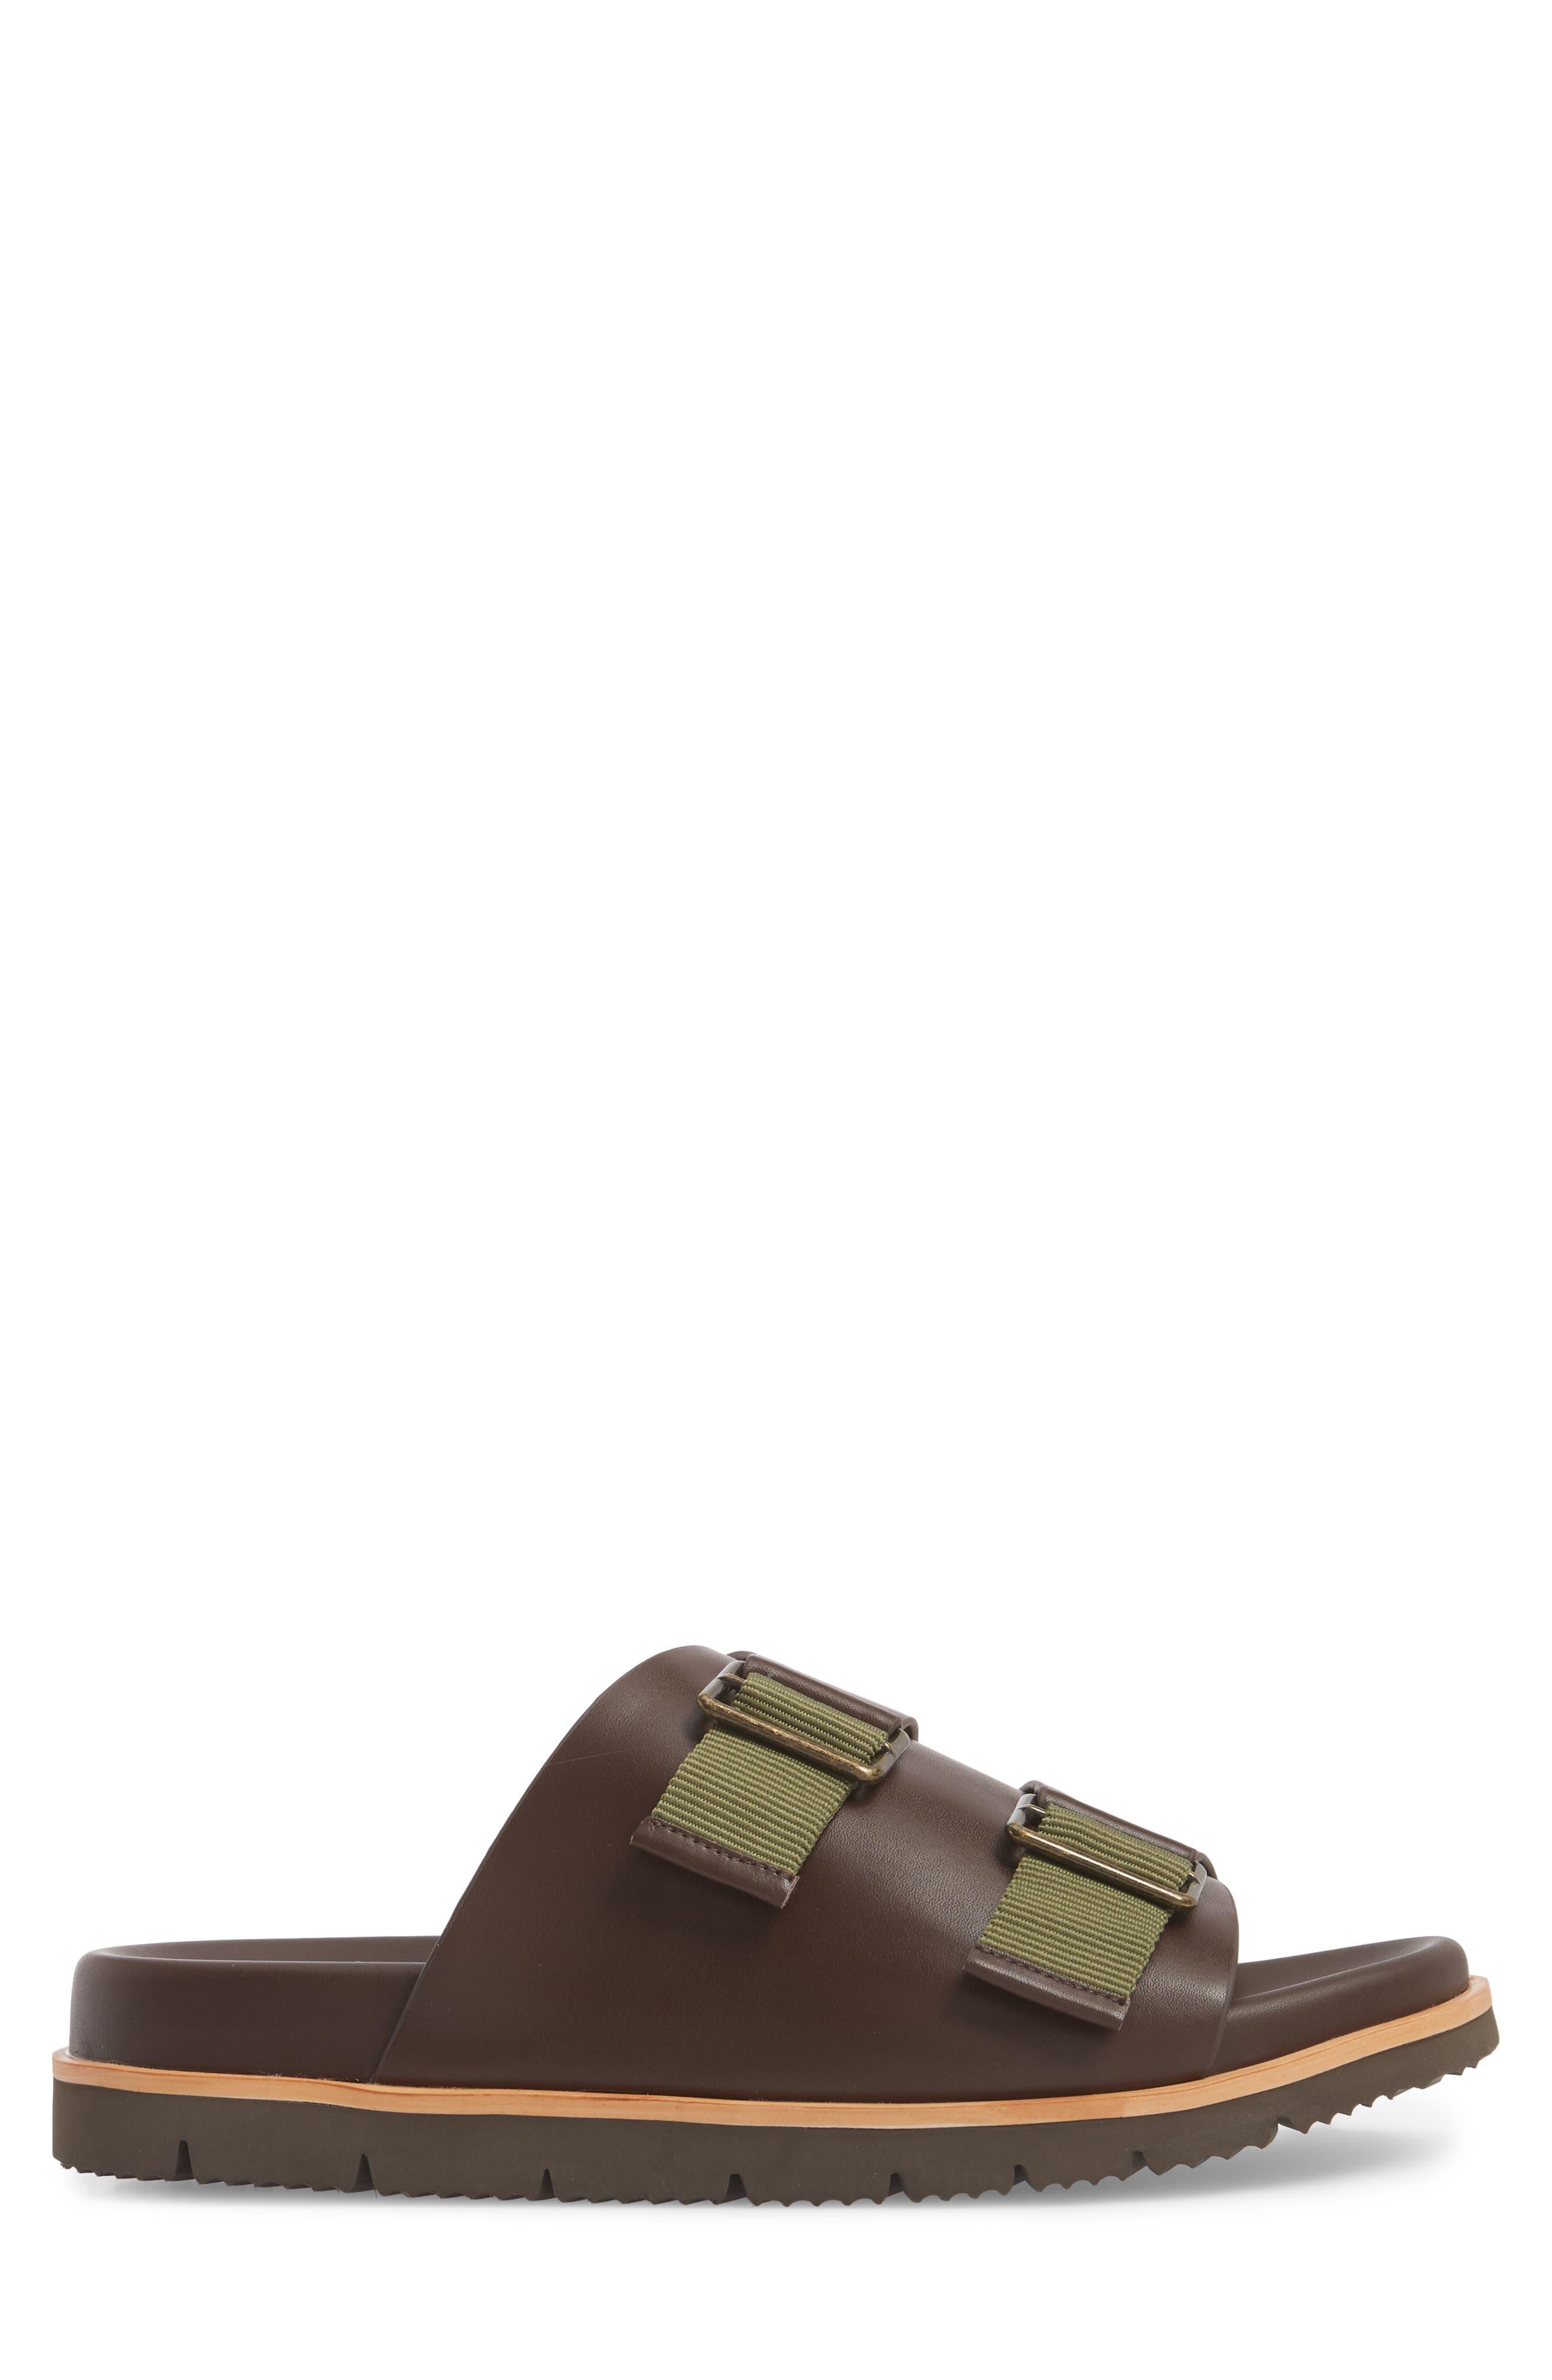 Slide Sandal,                             Alternate thumbnail 3, color,                             Expresso/ Tan Leather